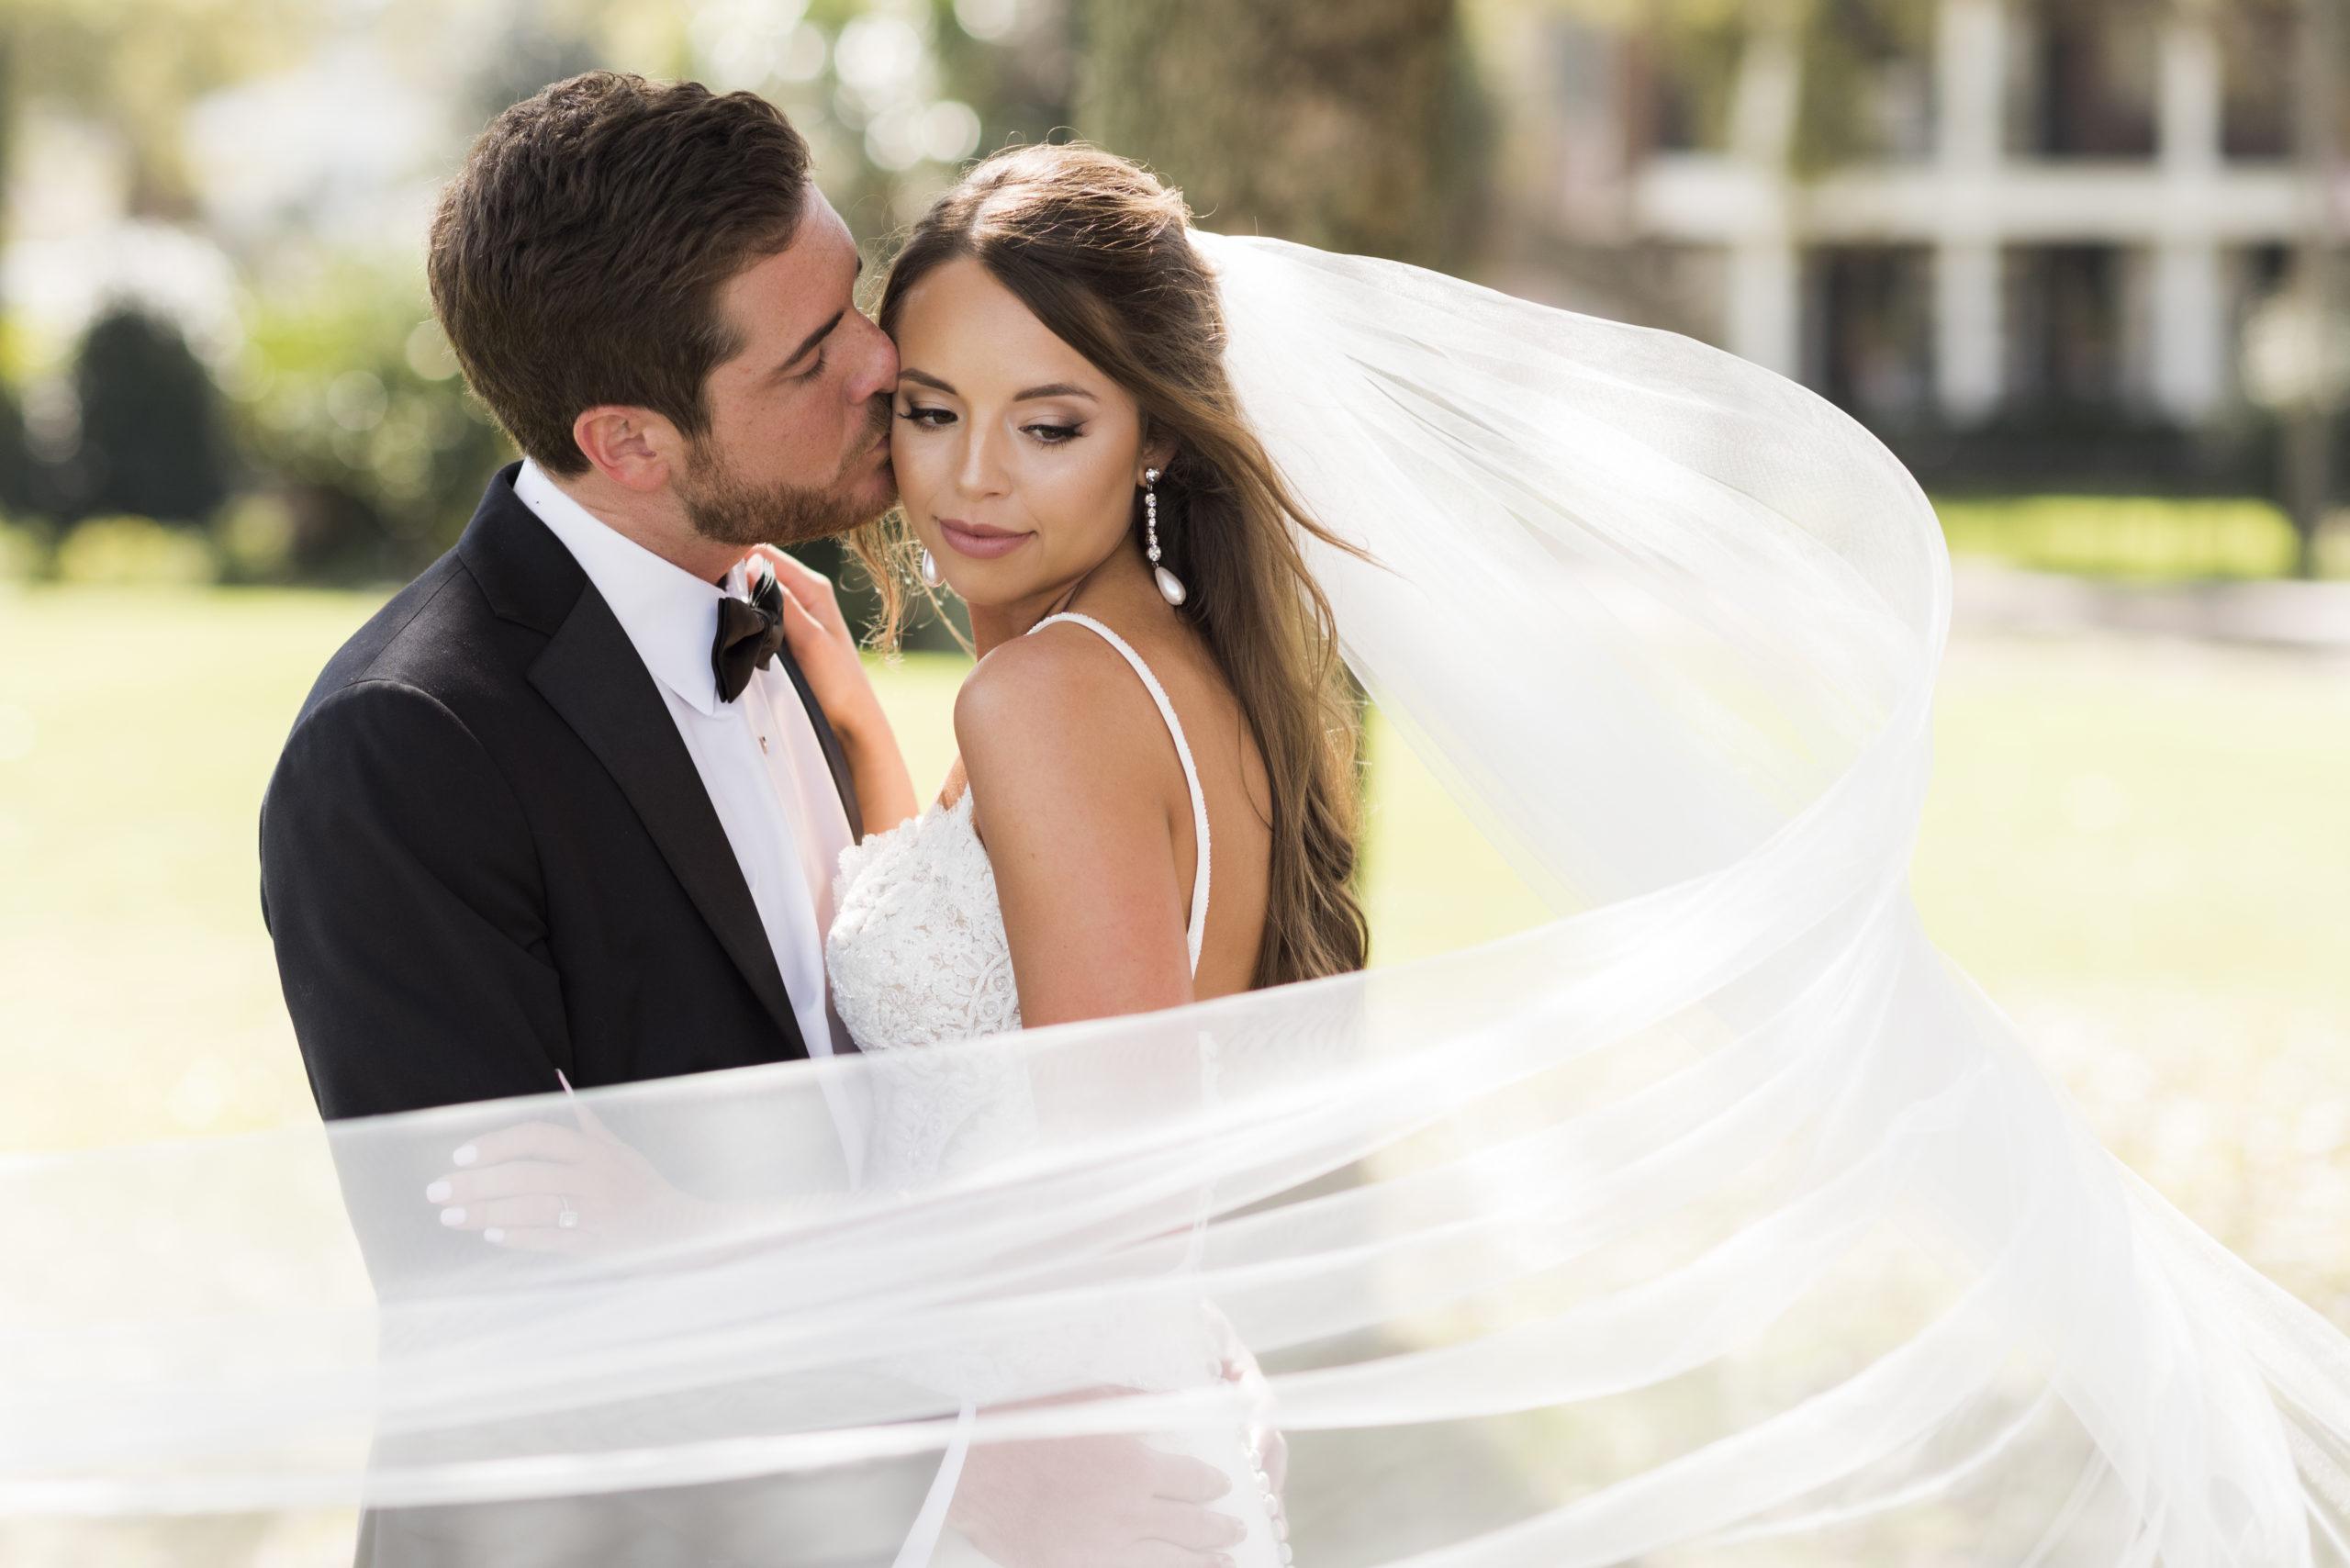 Engagement shoot - Aislinn Kate Wedding Photography - Pensacola, Florida